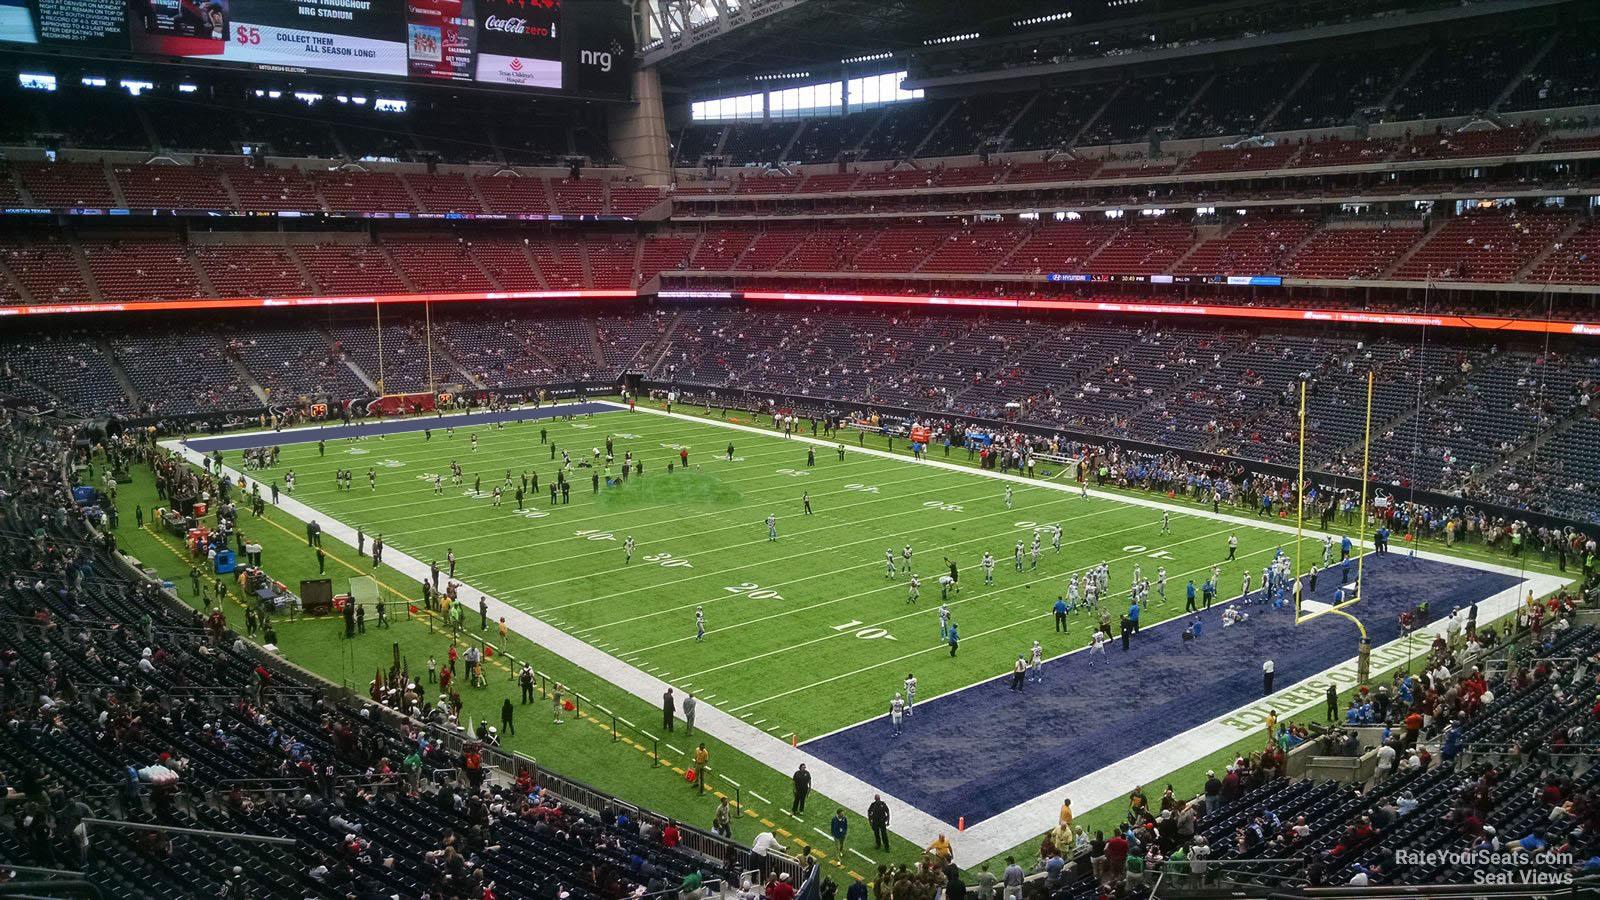 West Houston Vw >> NRG Stadium Section 302 - Houston Texans - RateYourSeats.com